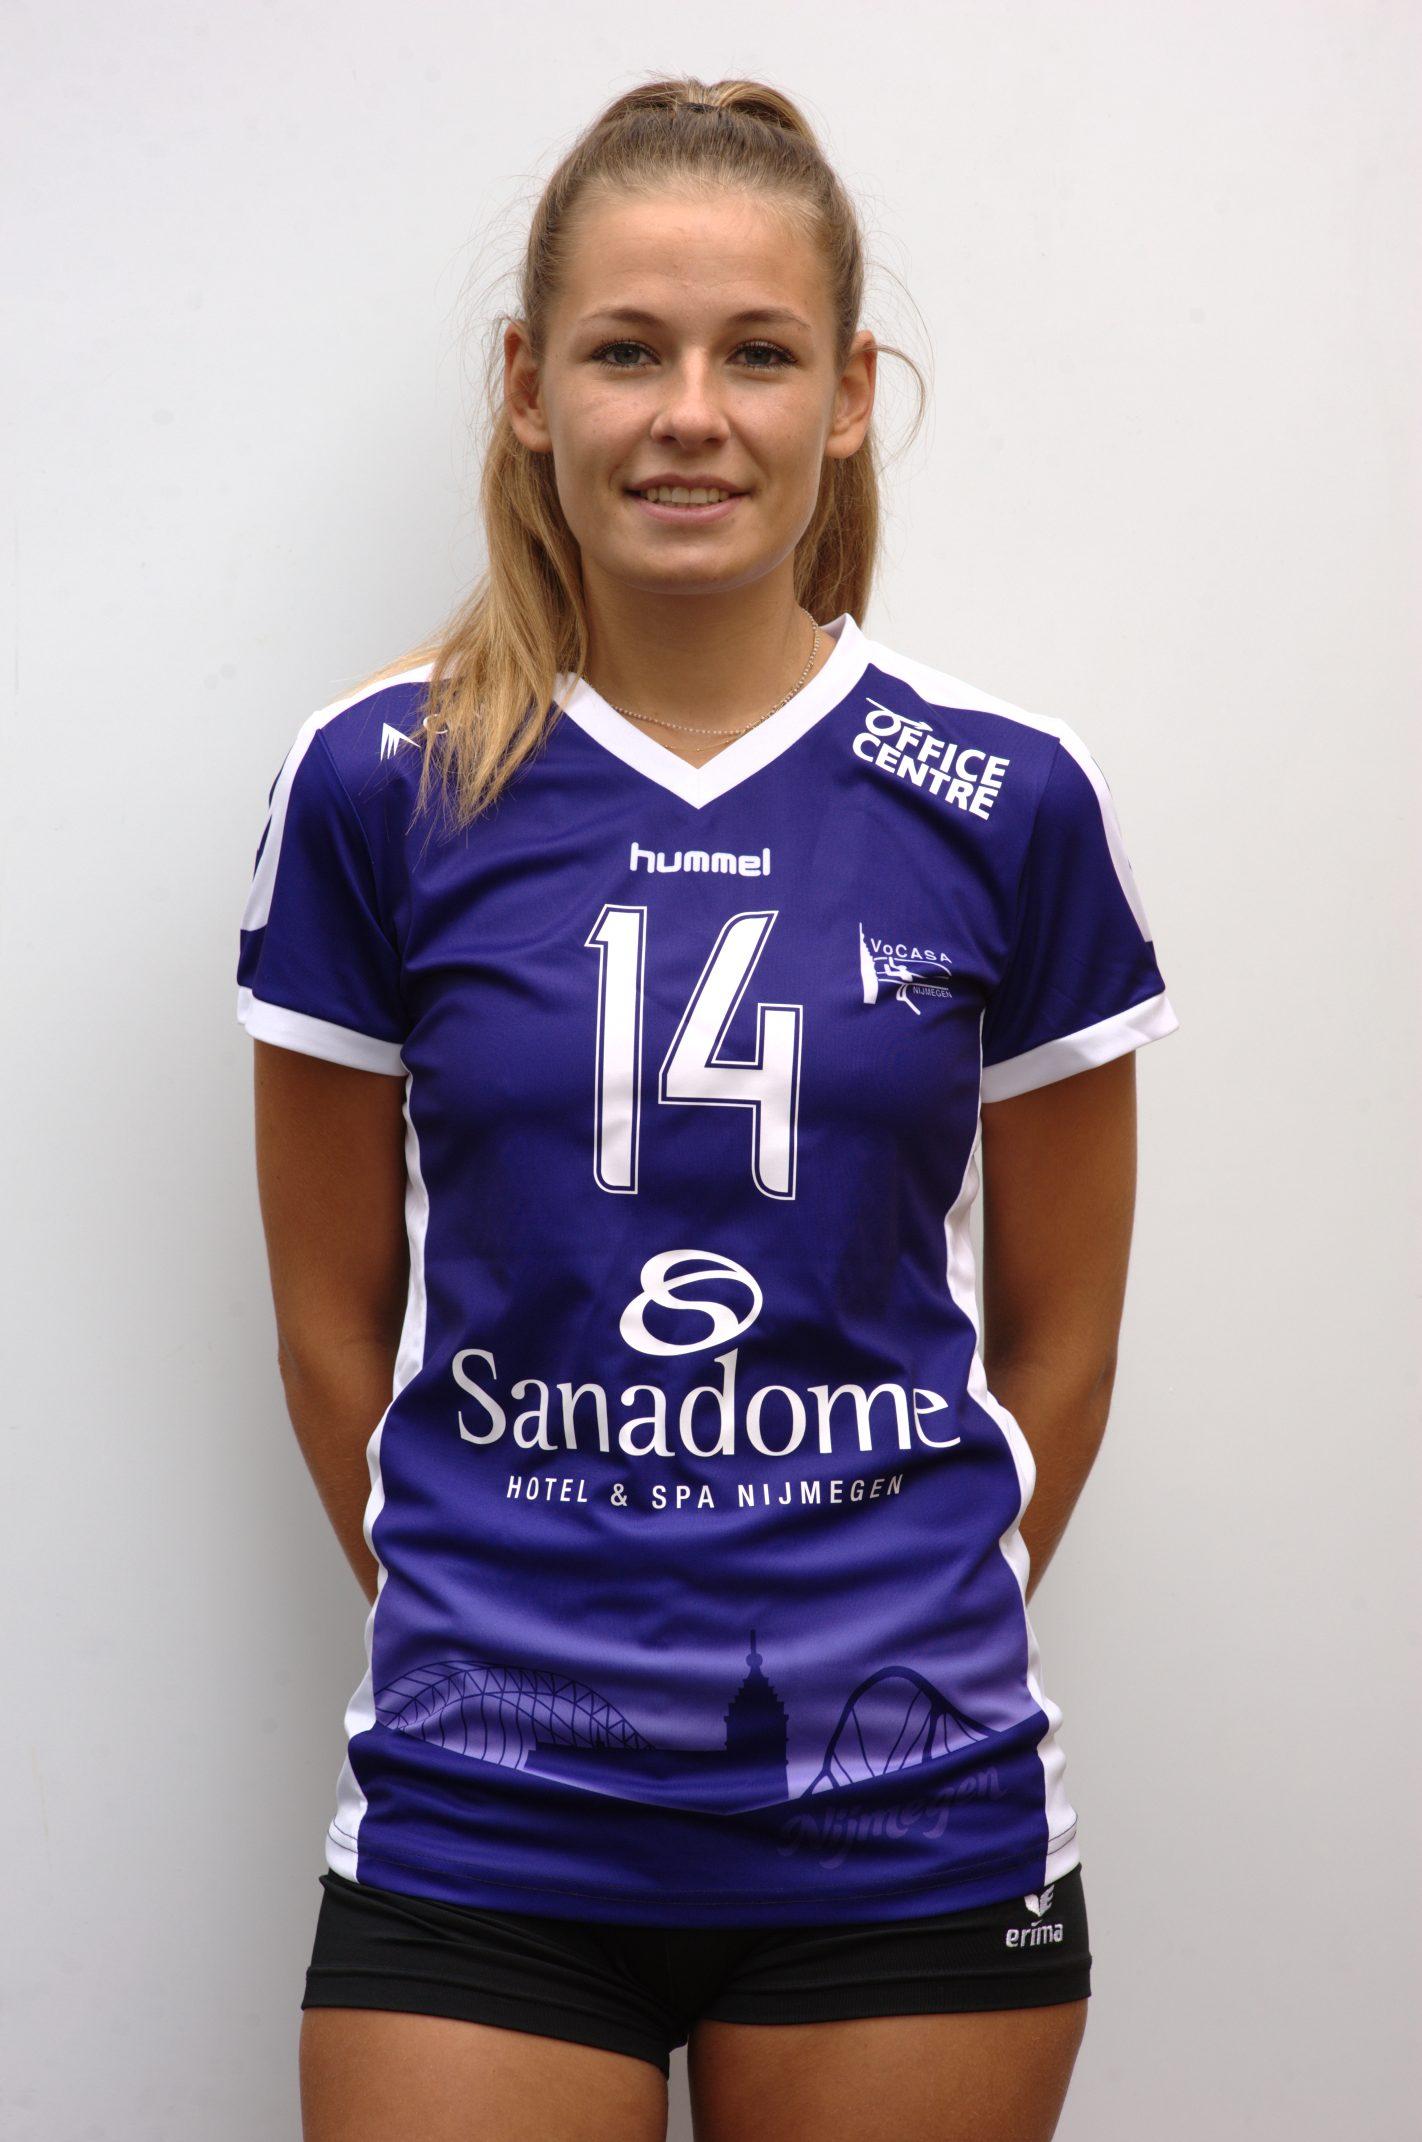 14 Anne Berendsen (PL/Lib)